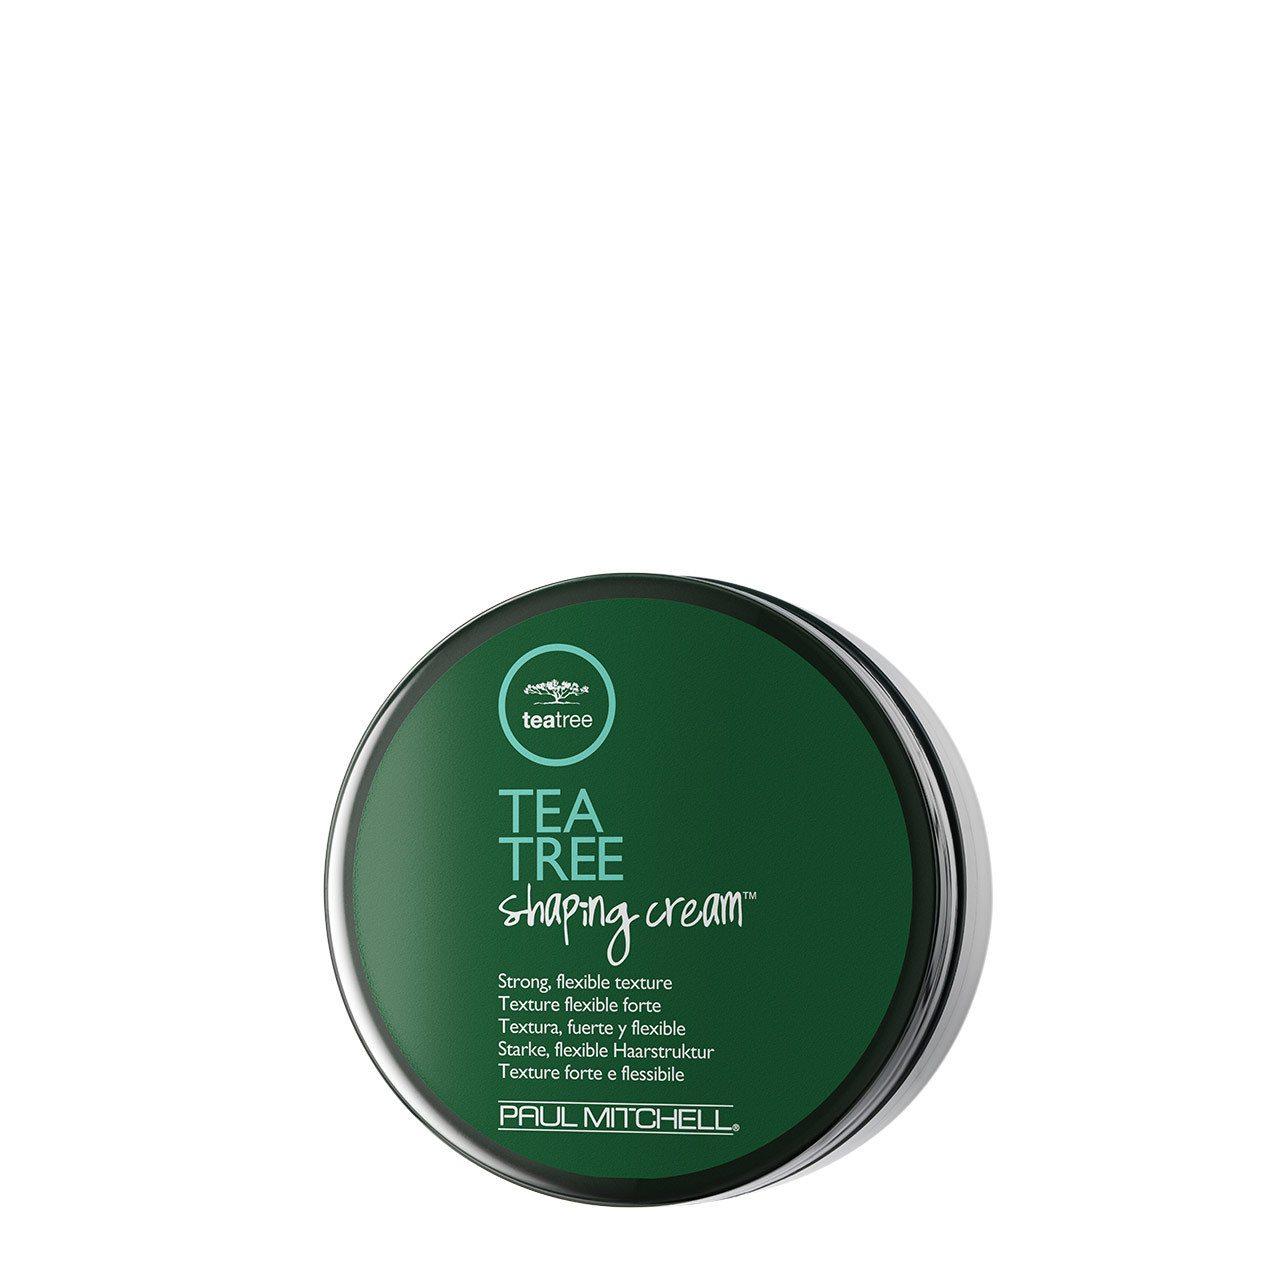 Paul Mitchell Tea Tree Shaping Cream 3.5oz